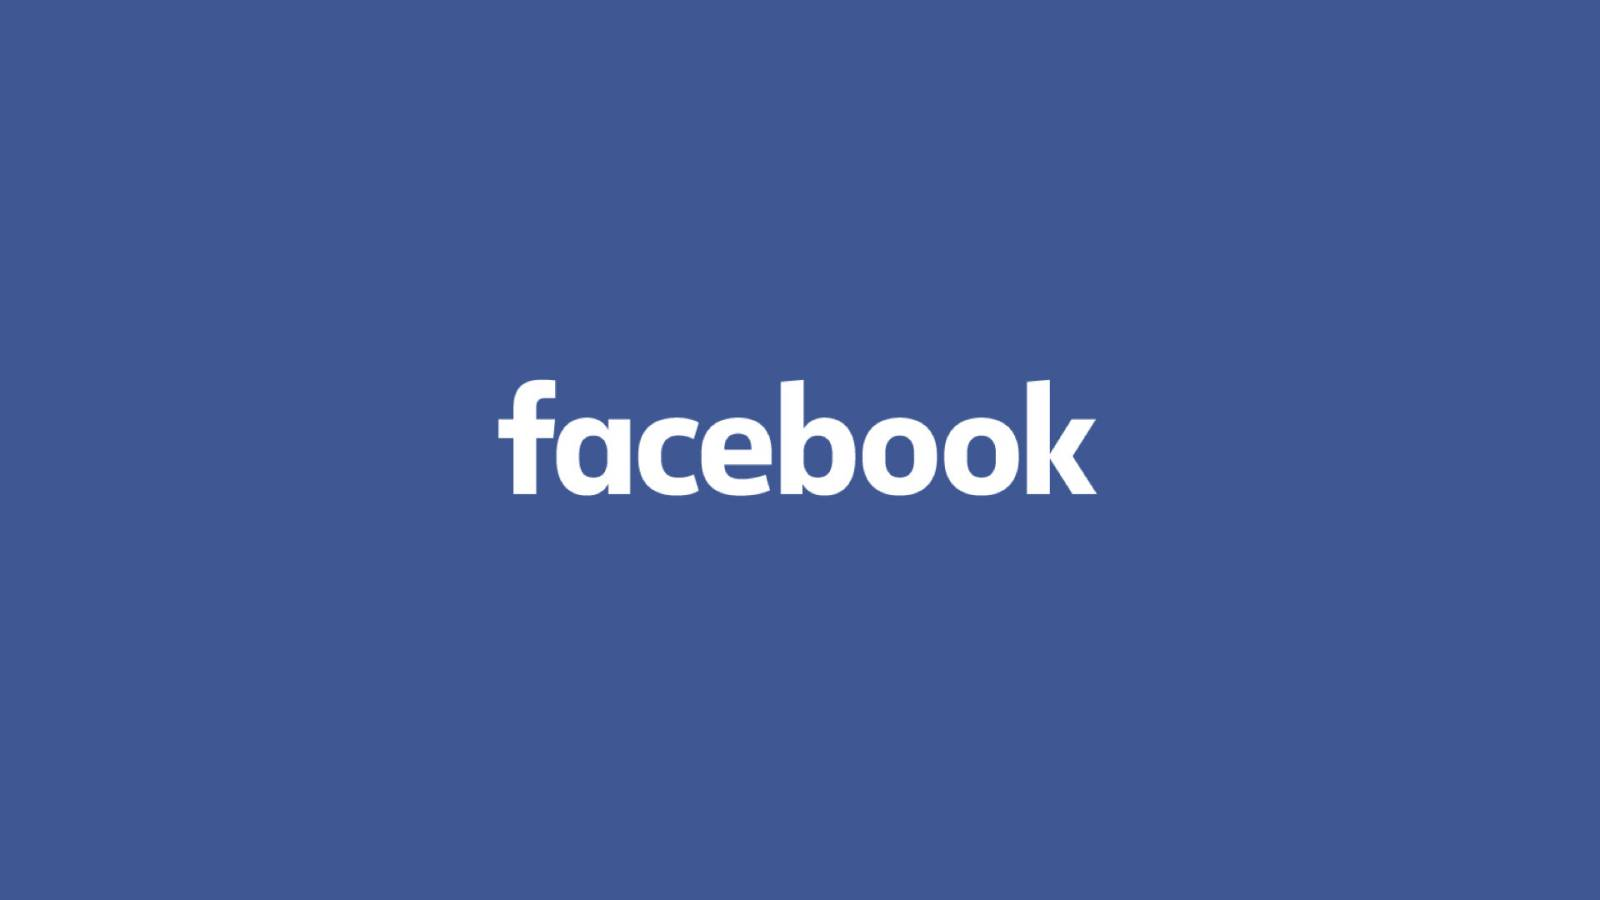 Facebook Update Nou Lansat Aplicatia Telefoane Tablete